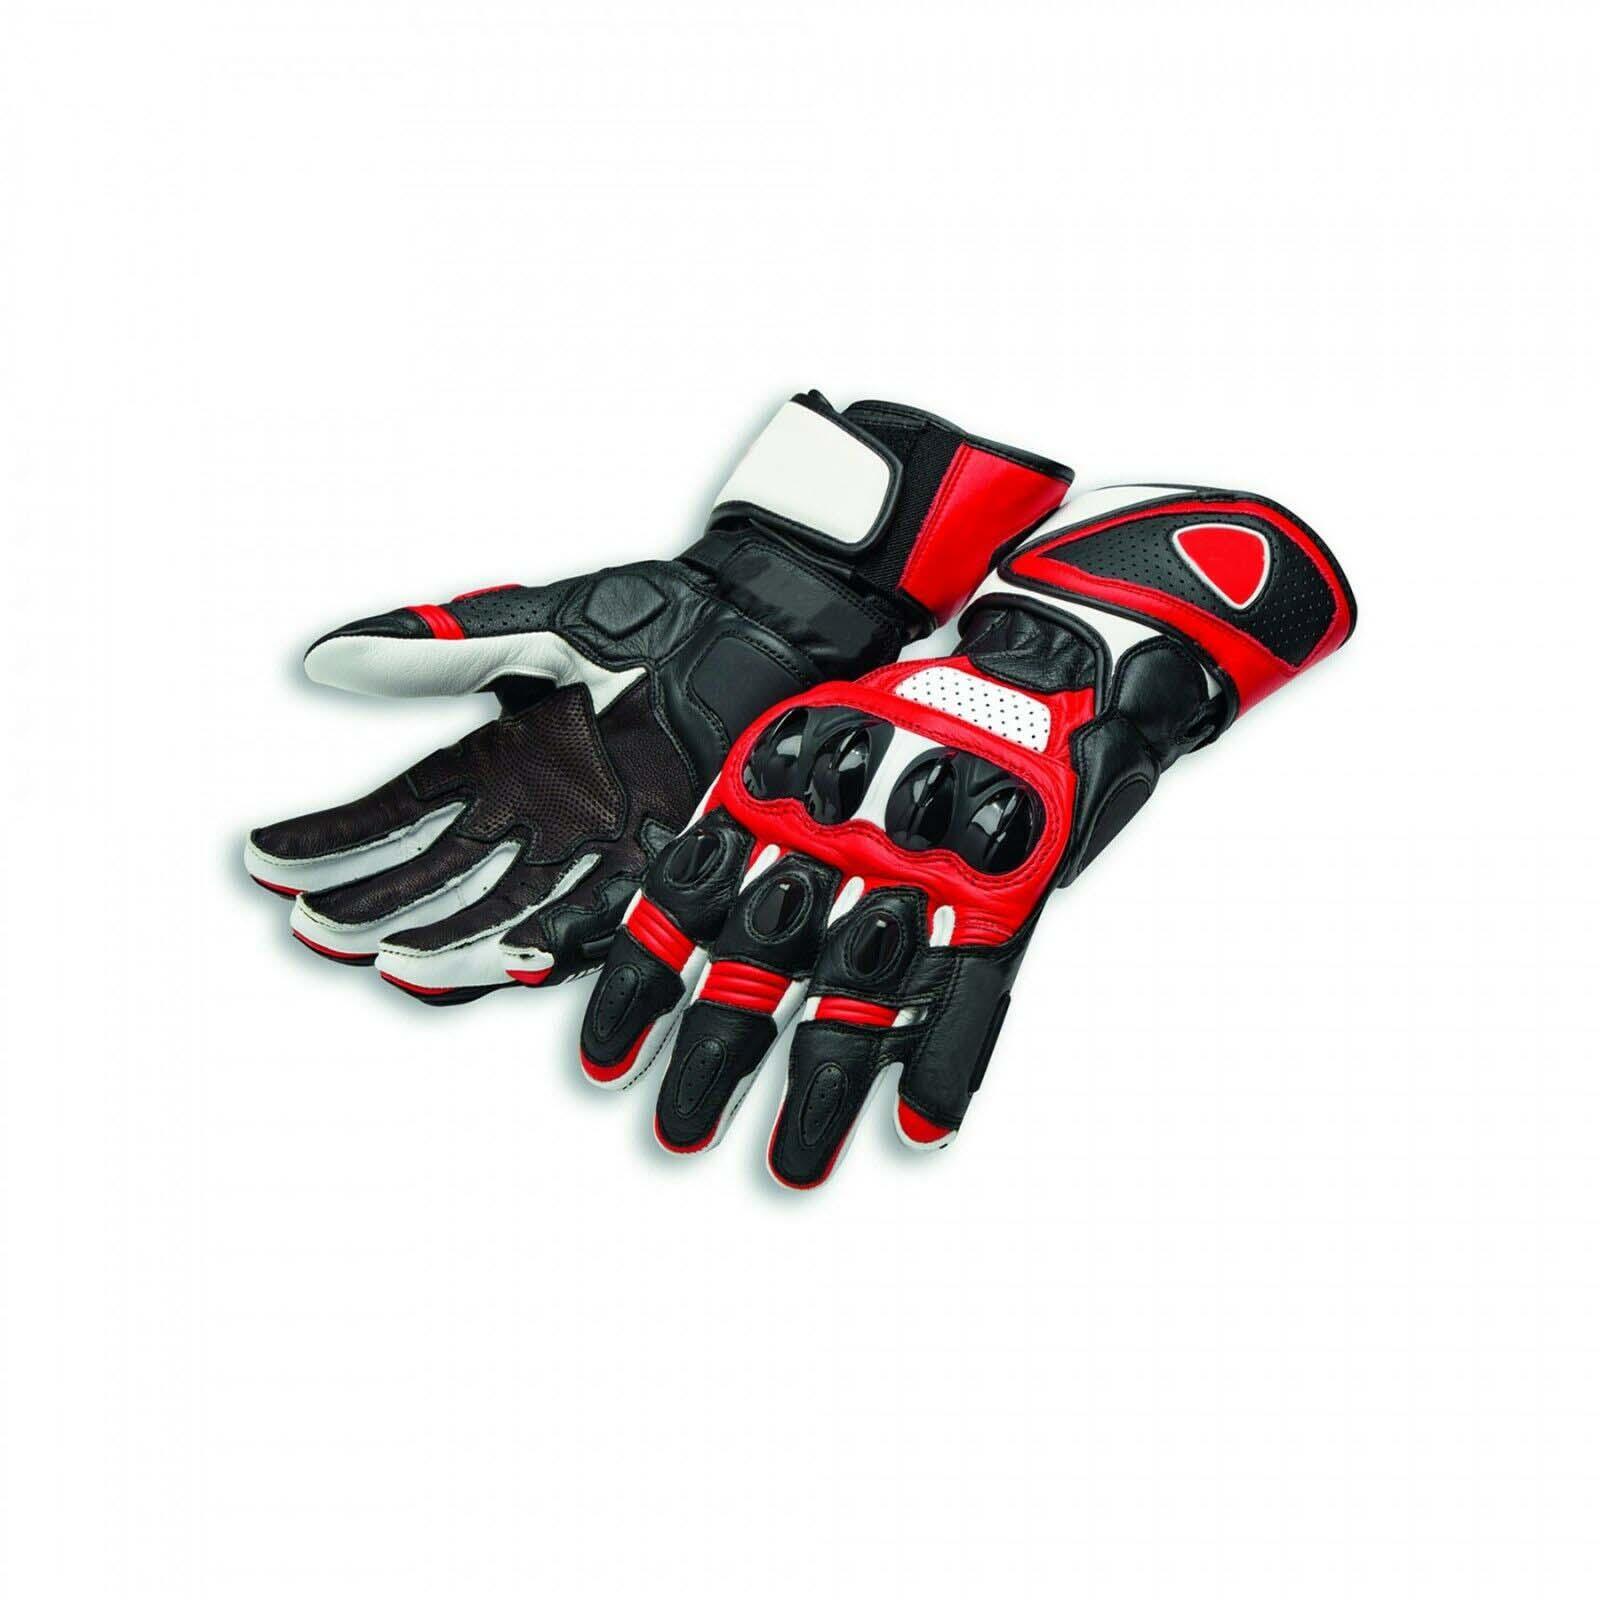 NEW Genuine Leather Speed Evo C1 For Ducati Motorcycle Gloves Racing Gloves Driving Motorbike Gloves Original Cowhide Gloves